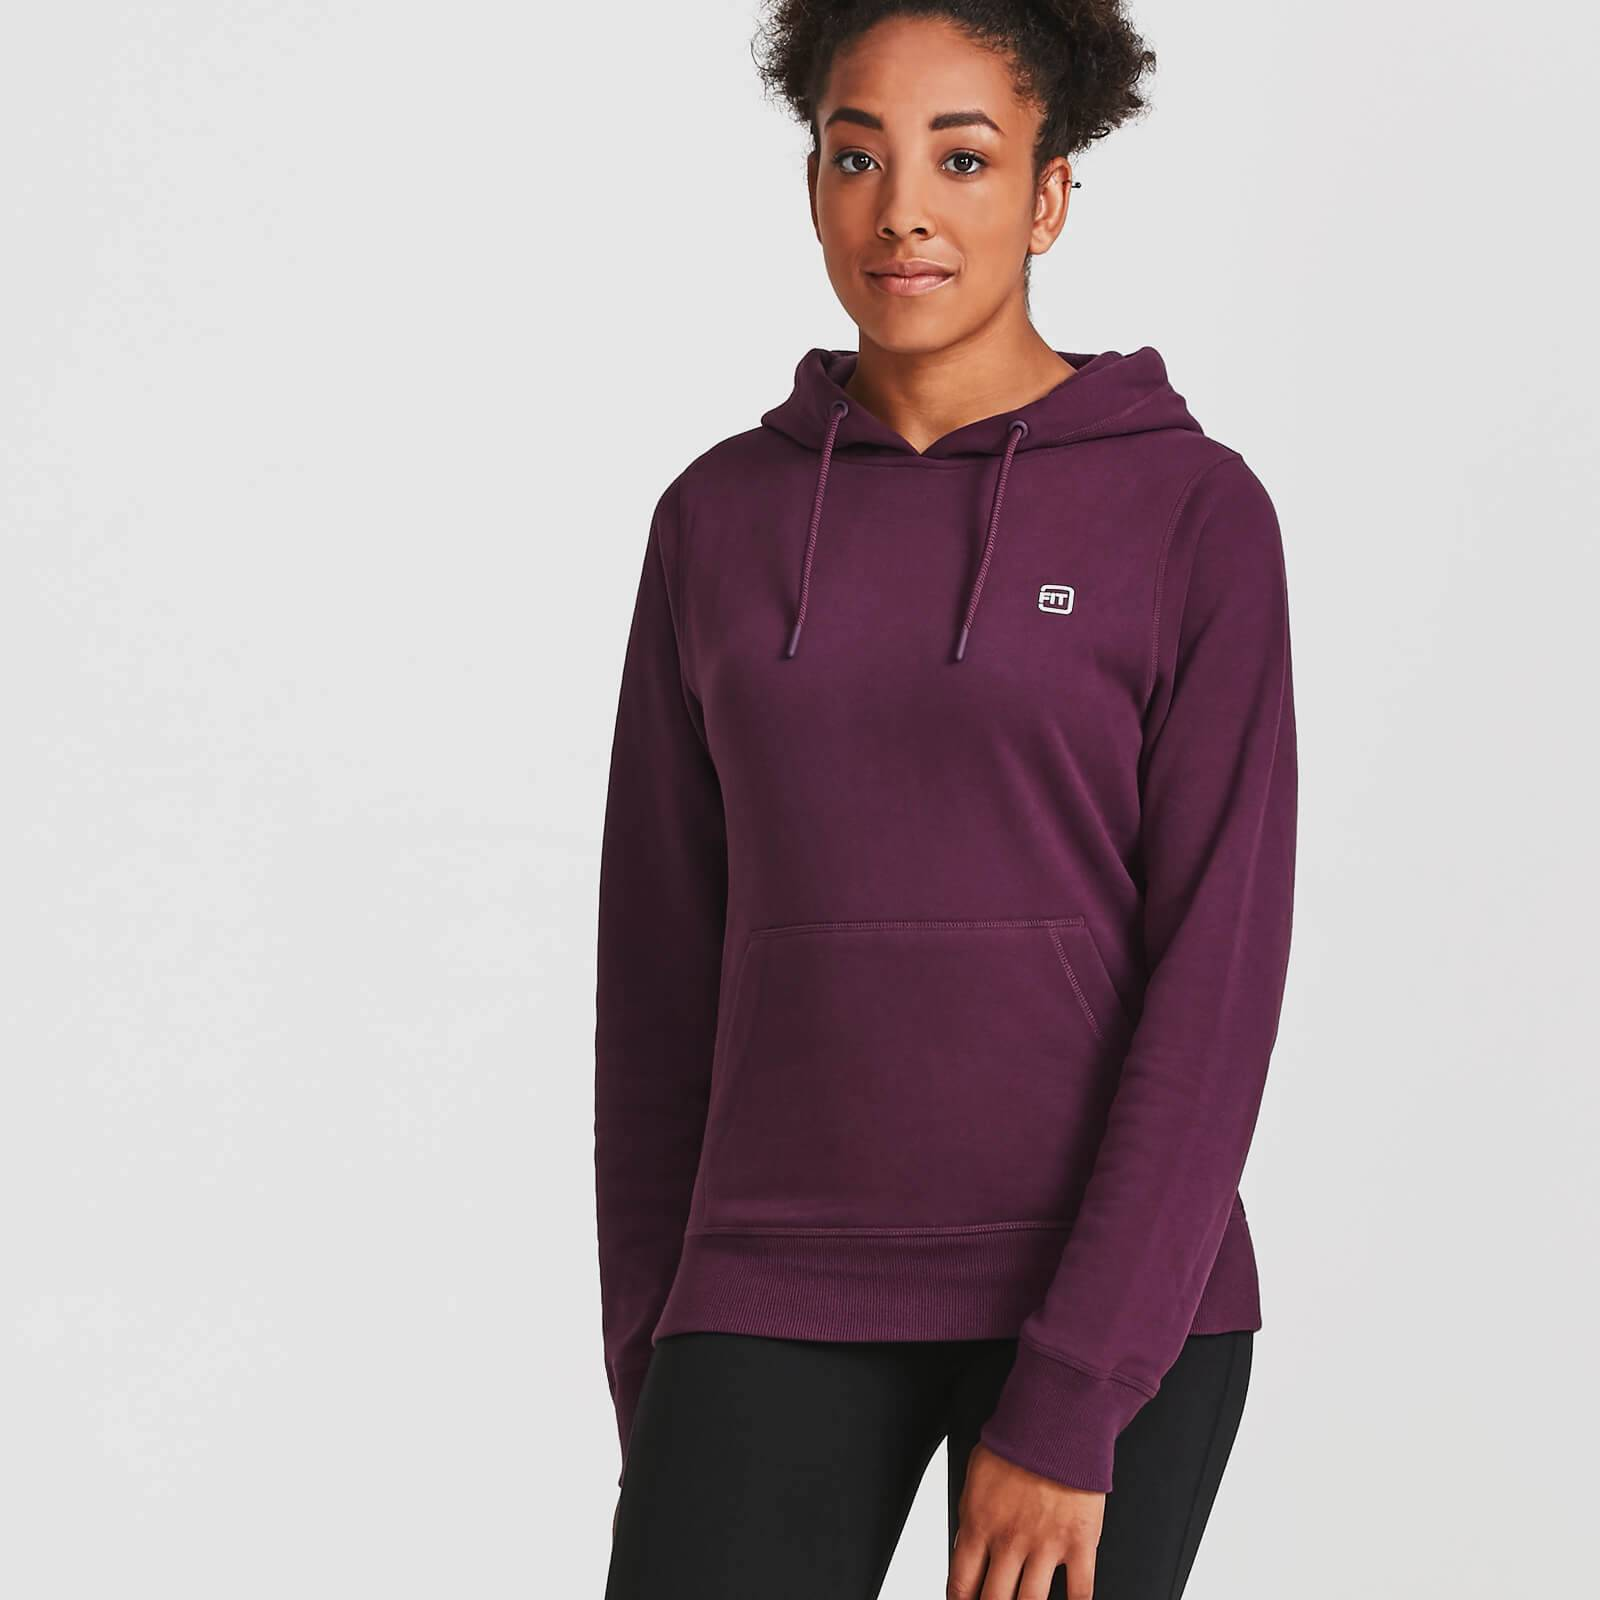 IdealFit Core Pullover Hoodie - M - Purple